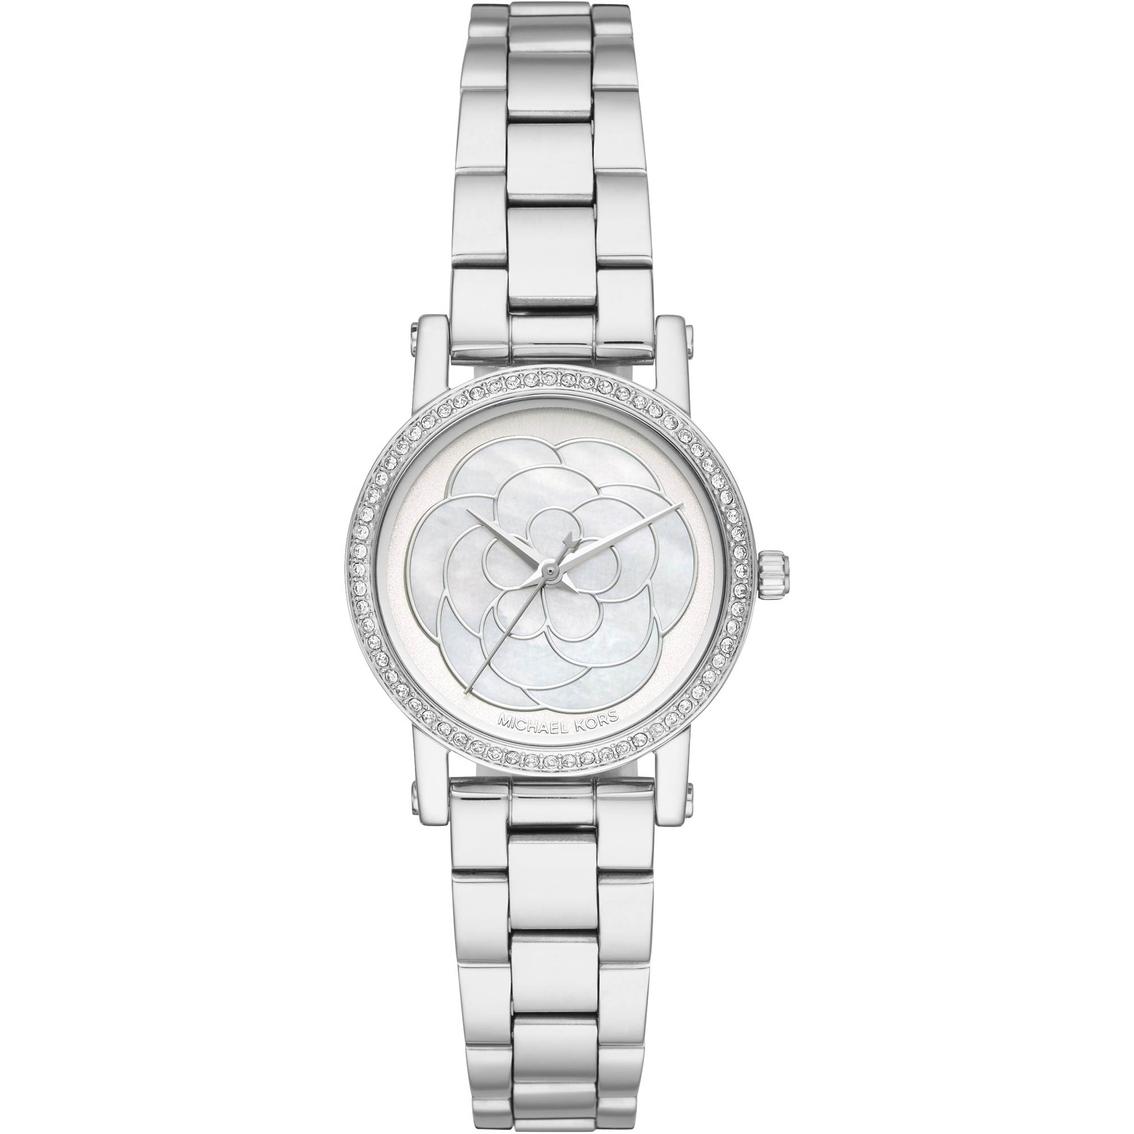 ced537d66c89 Michael Kors Women s Petite Norie Watch